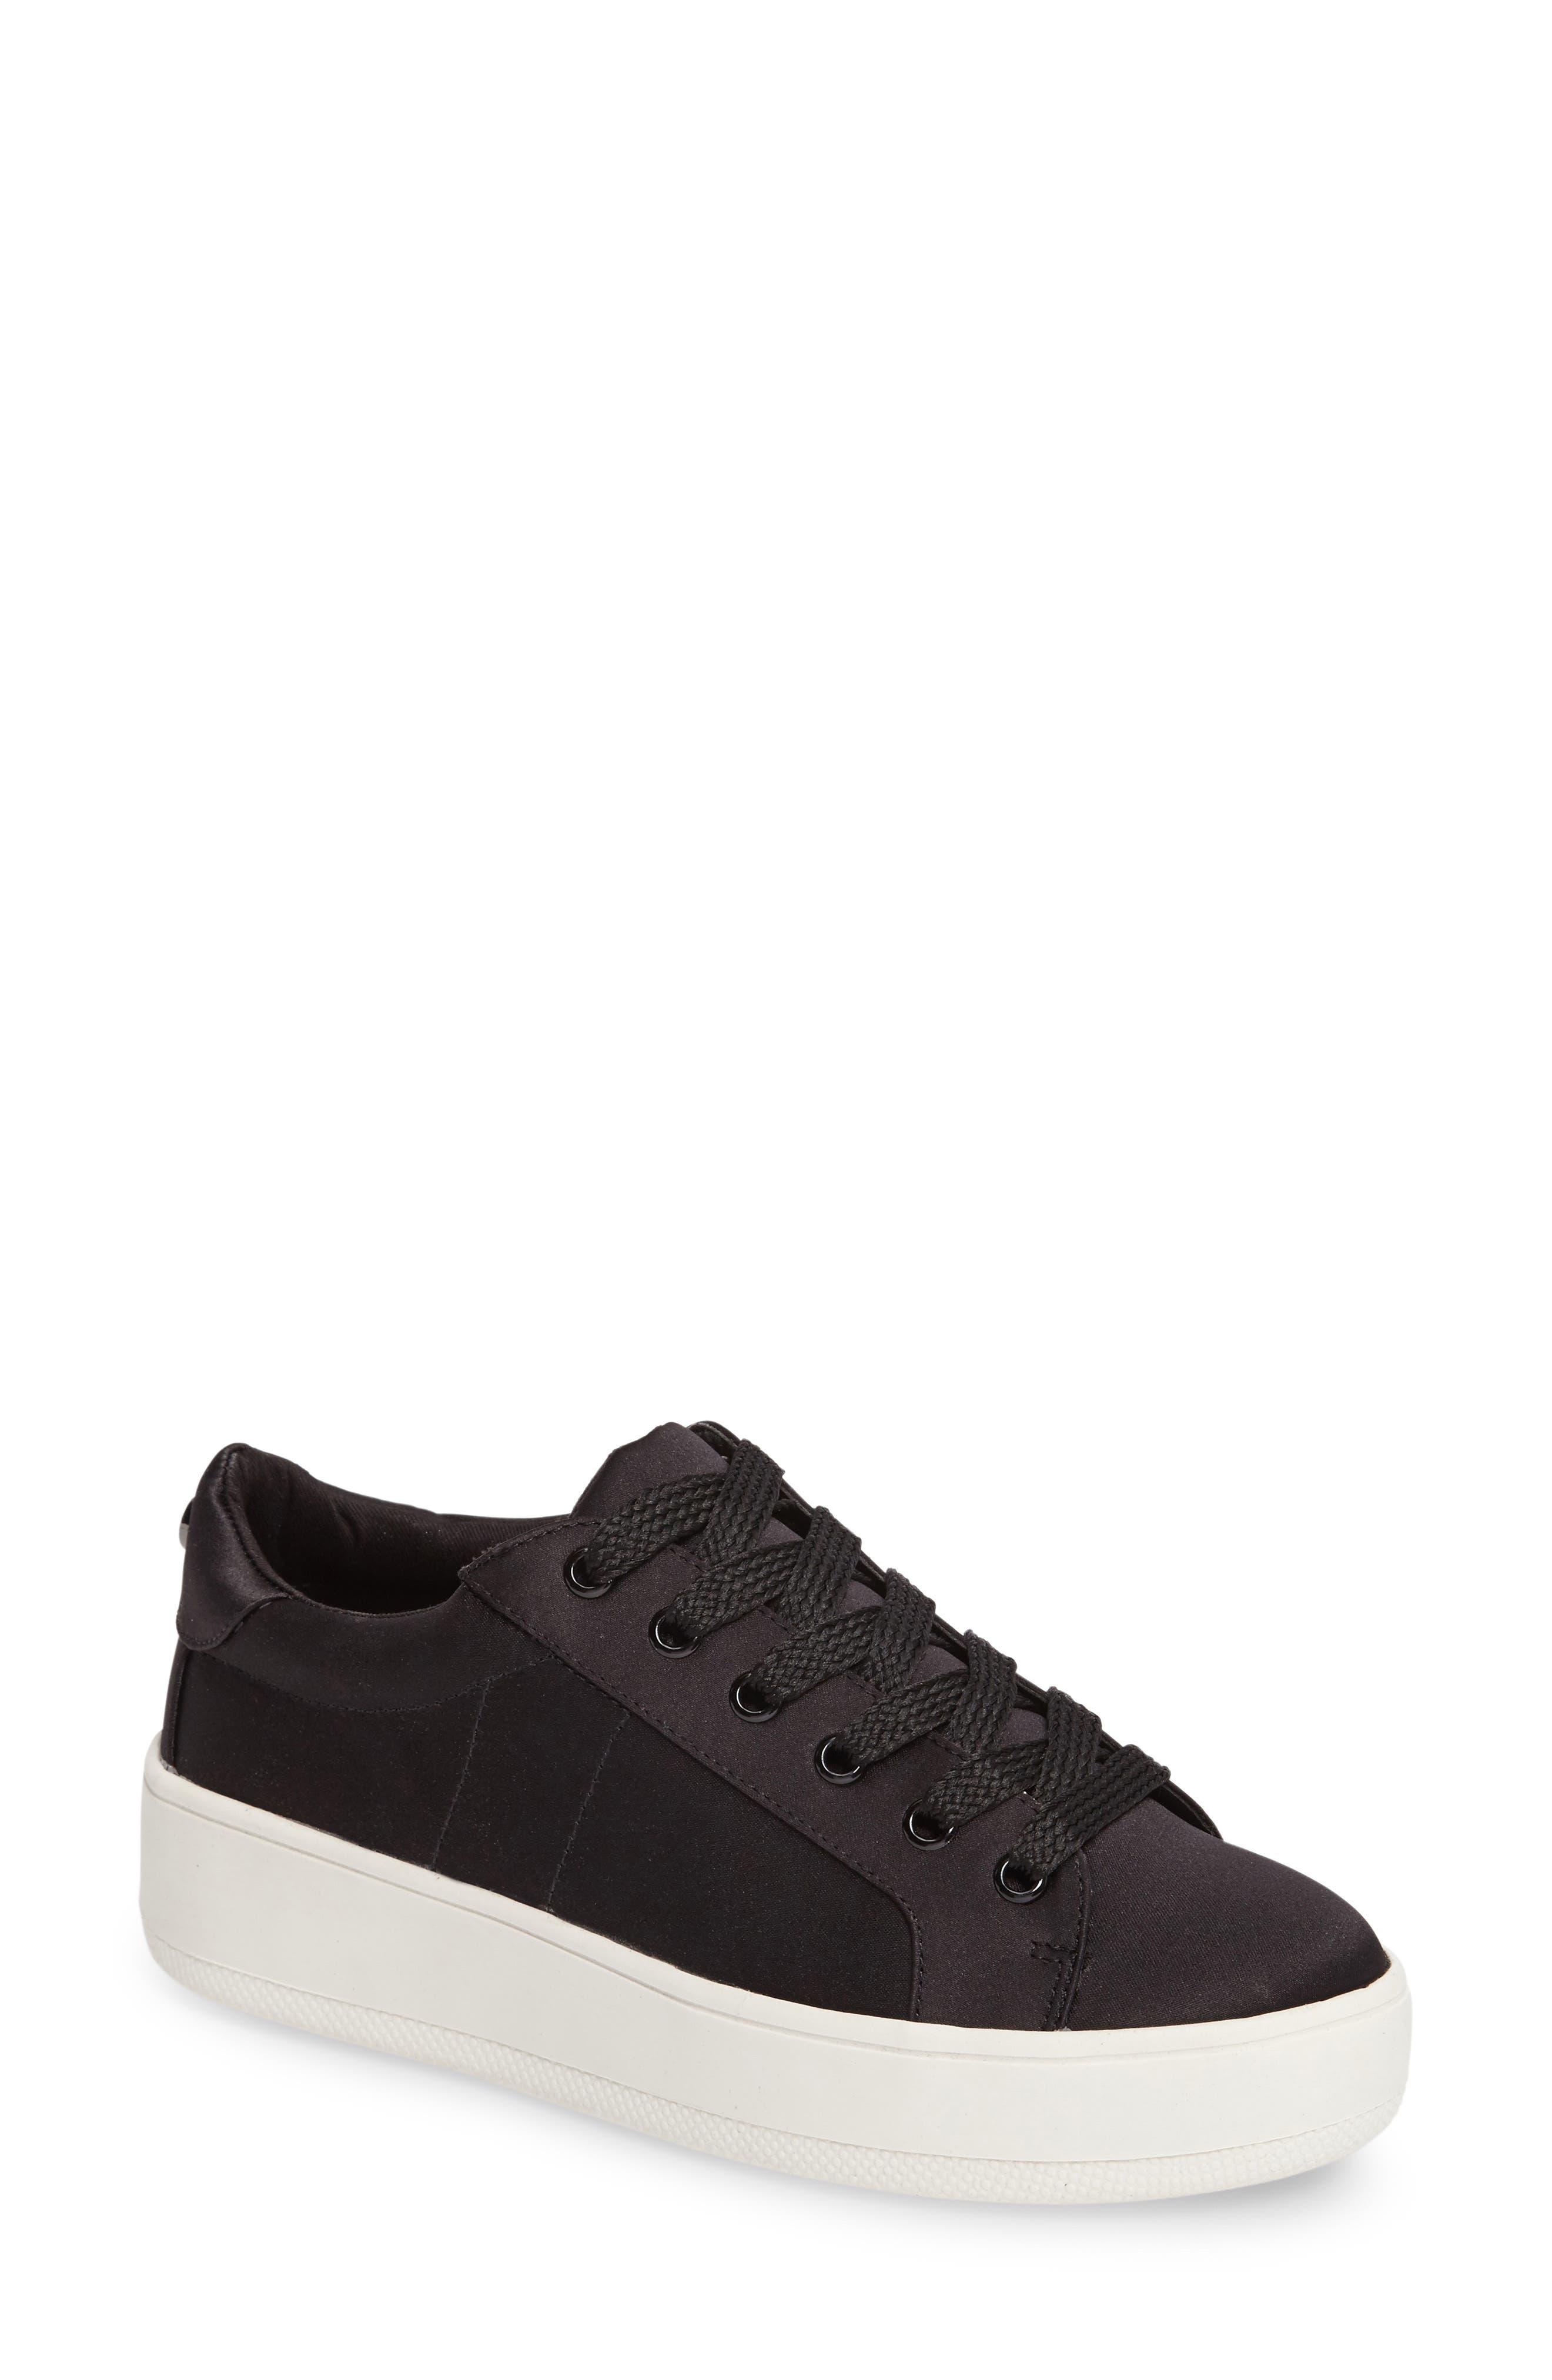 STEVE MADDEN Bertie-S Platform Sneaker